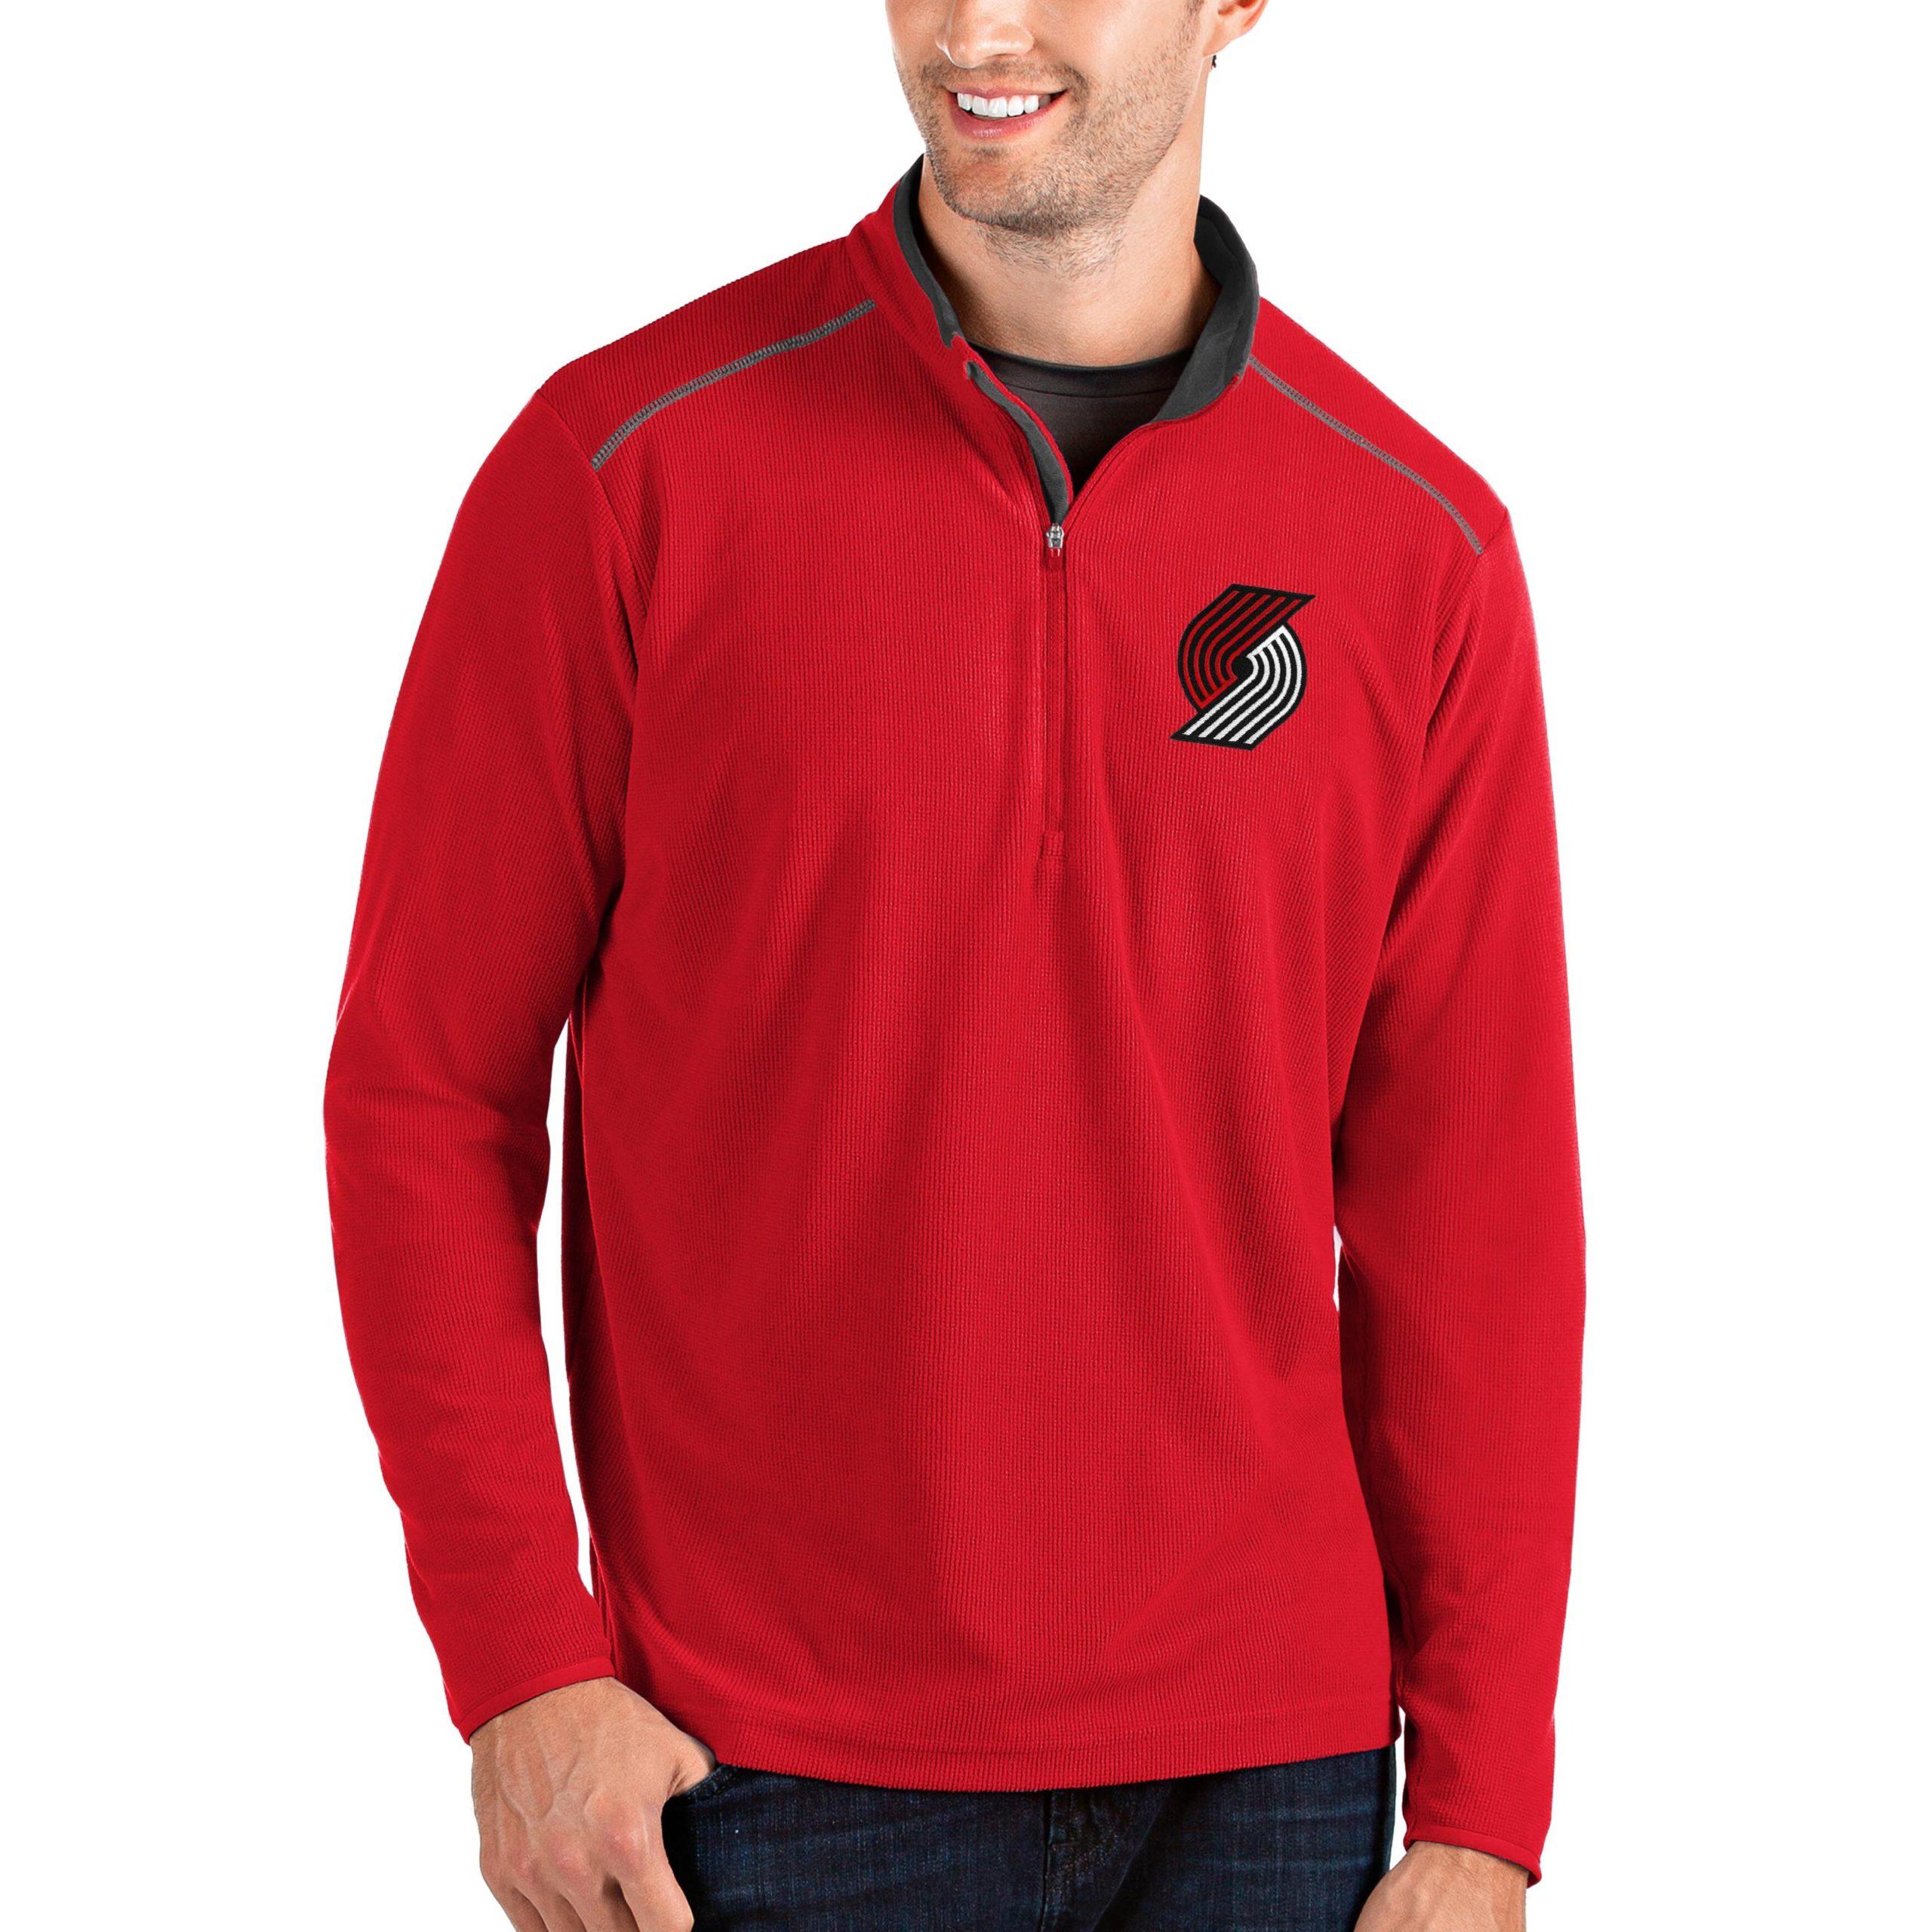 Portland Trail Blazers Antigua Big & Tall Glacier Quarter-Zip Pullover Jacket - Red/Gray